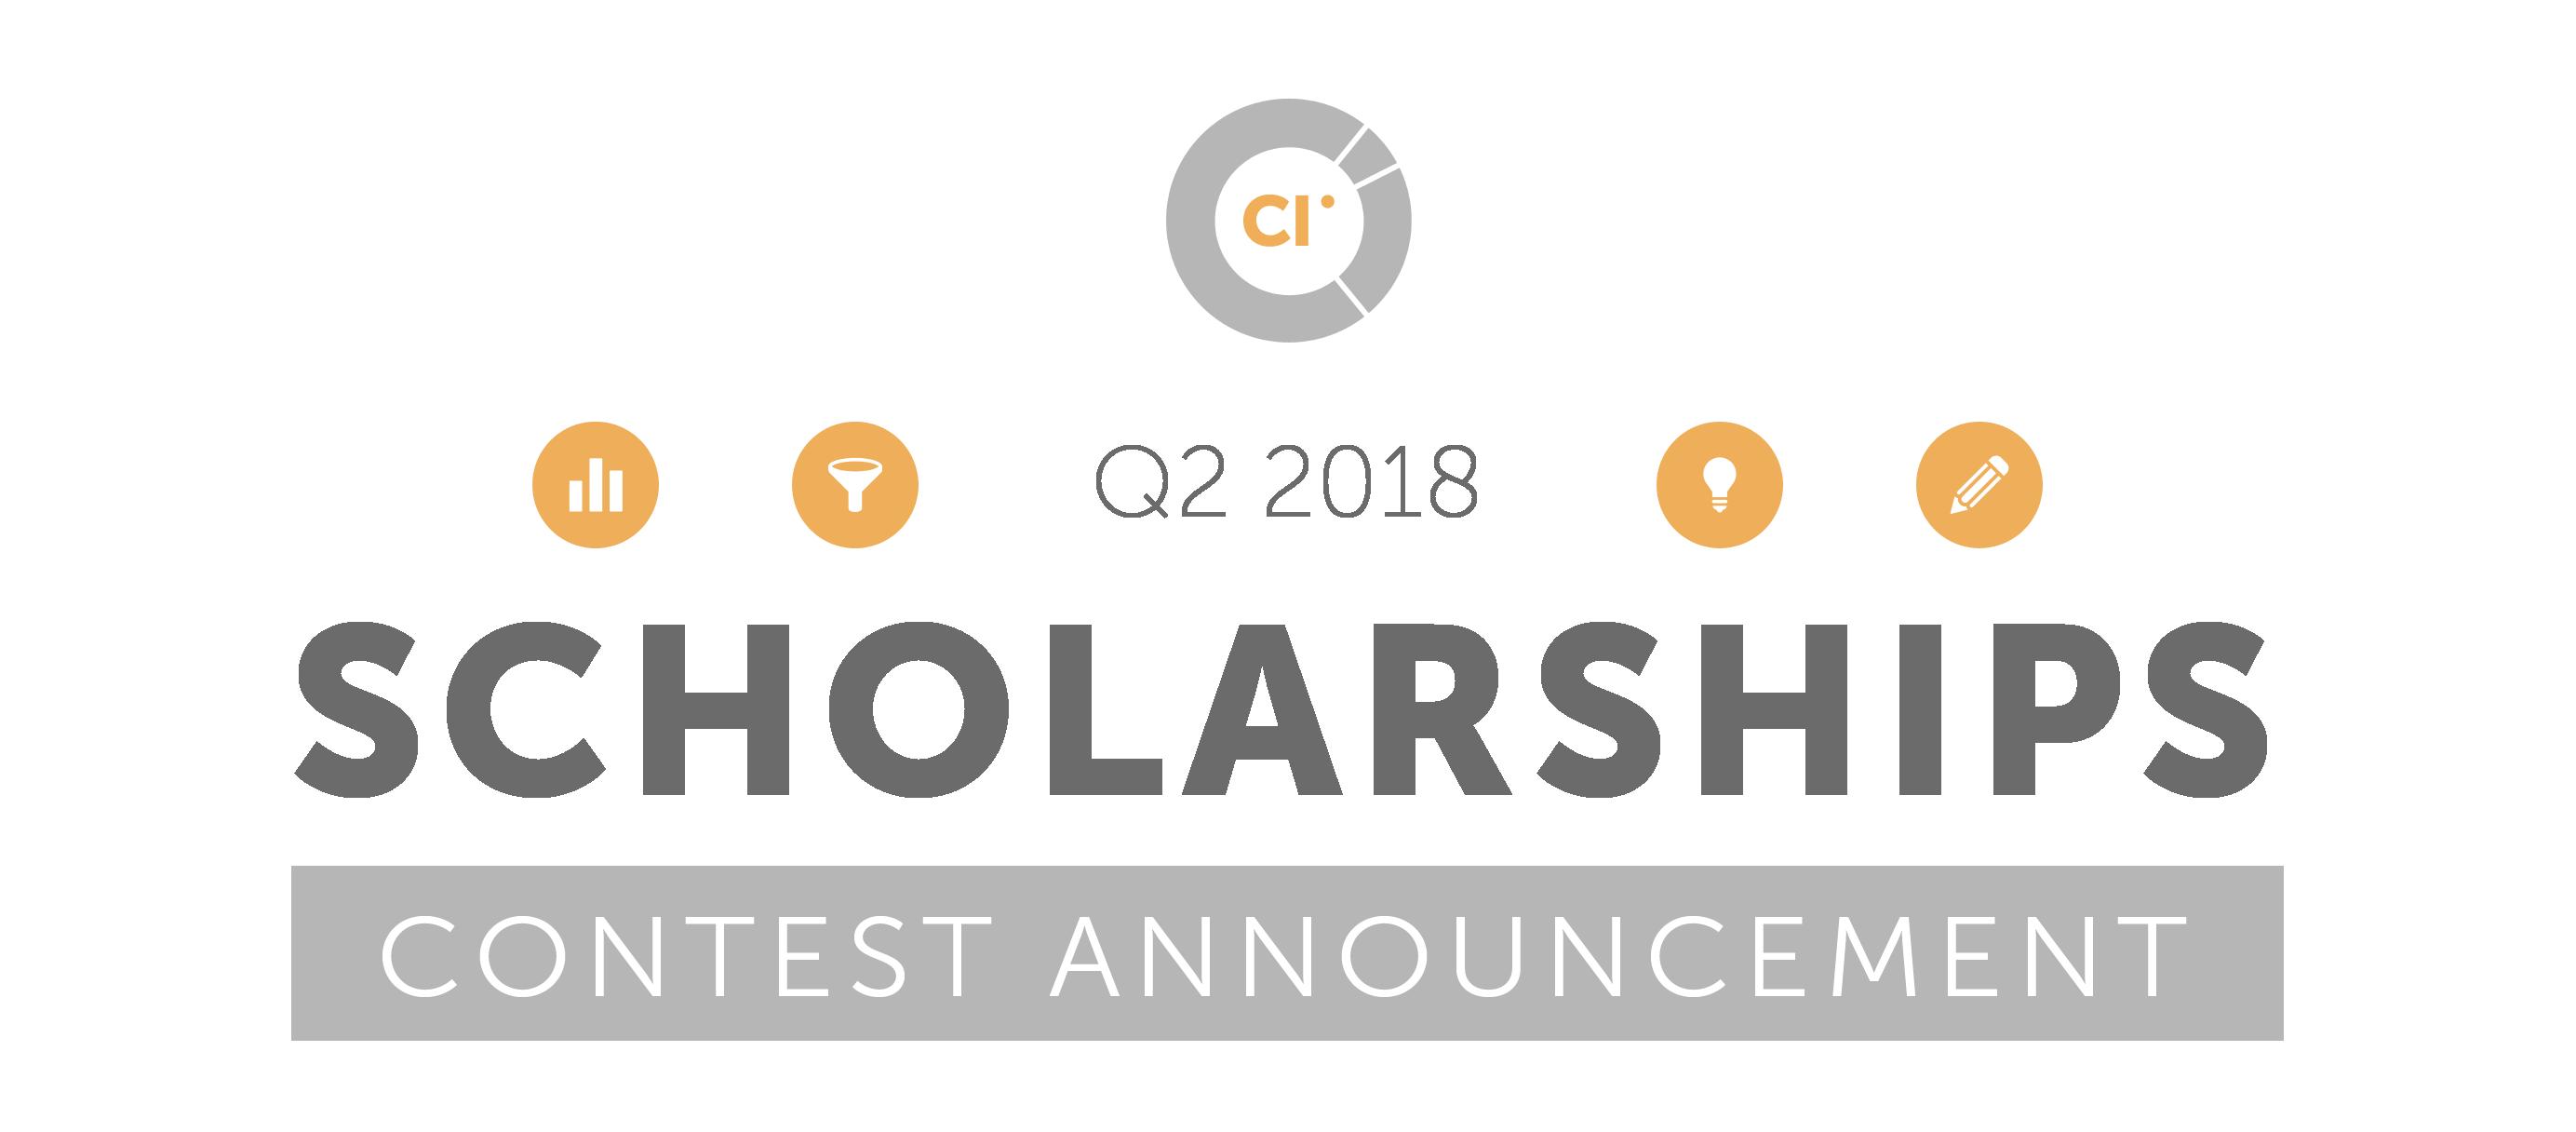 2018-Scholarship-Contest-Announcement